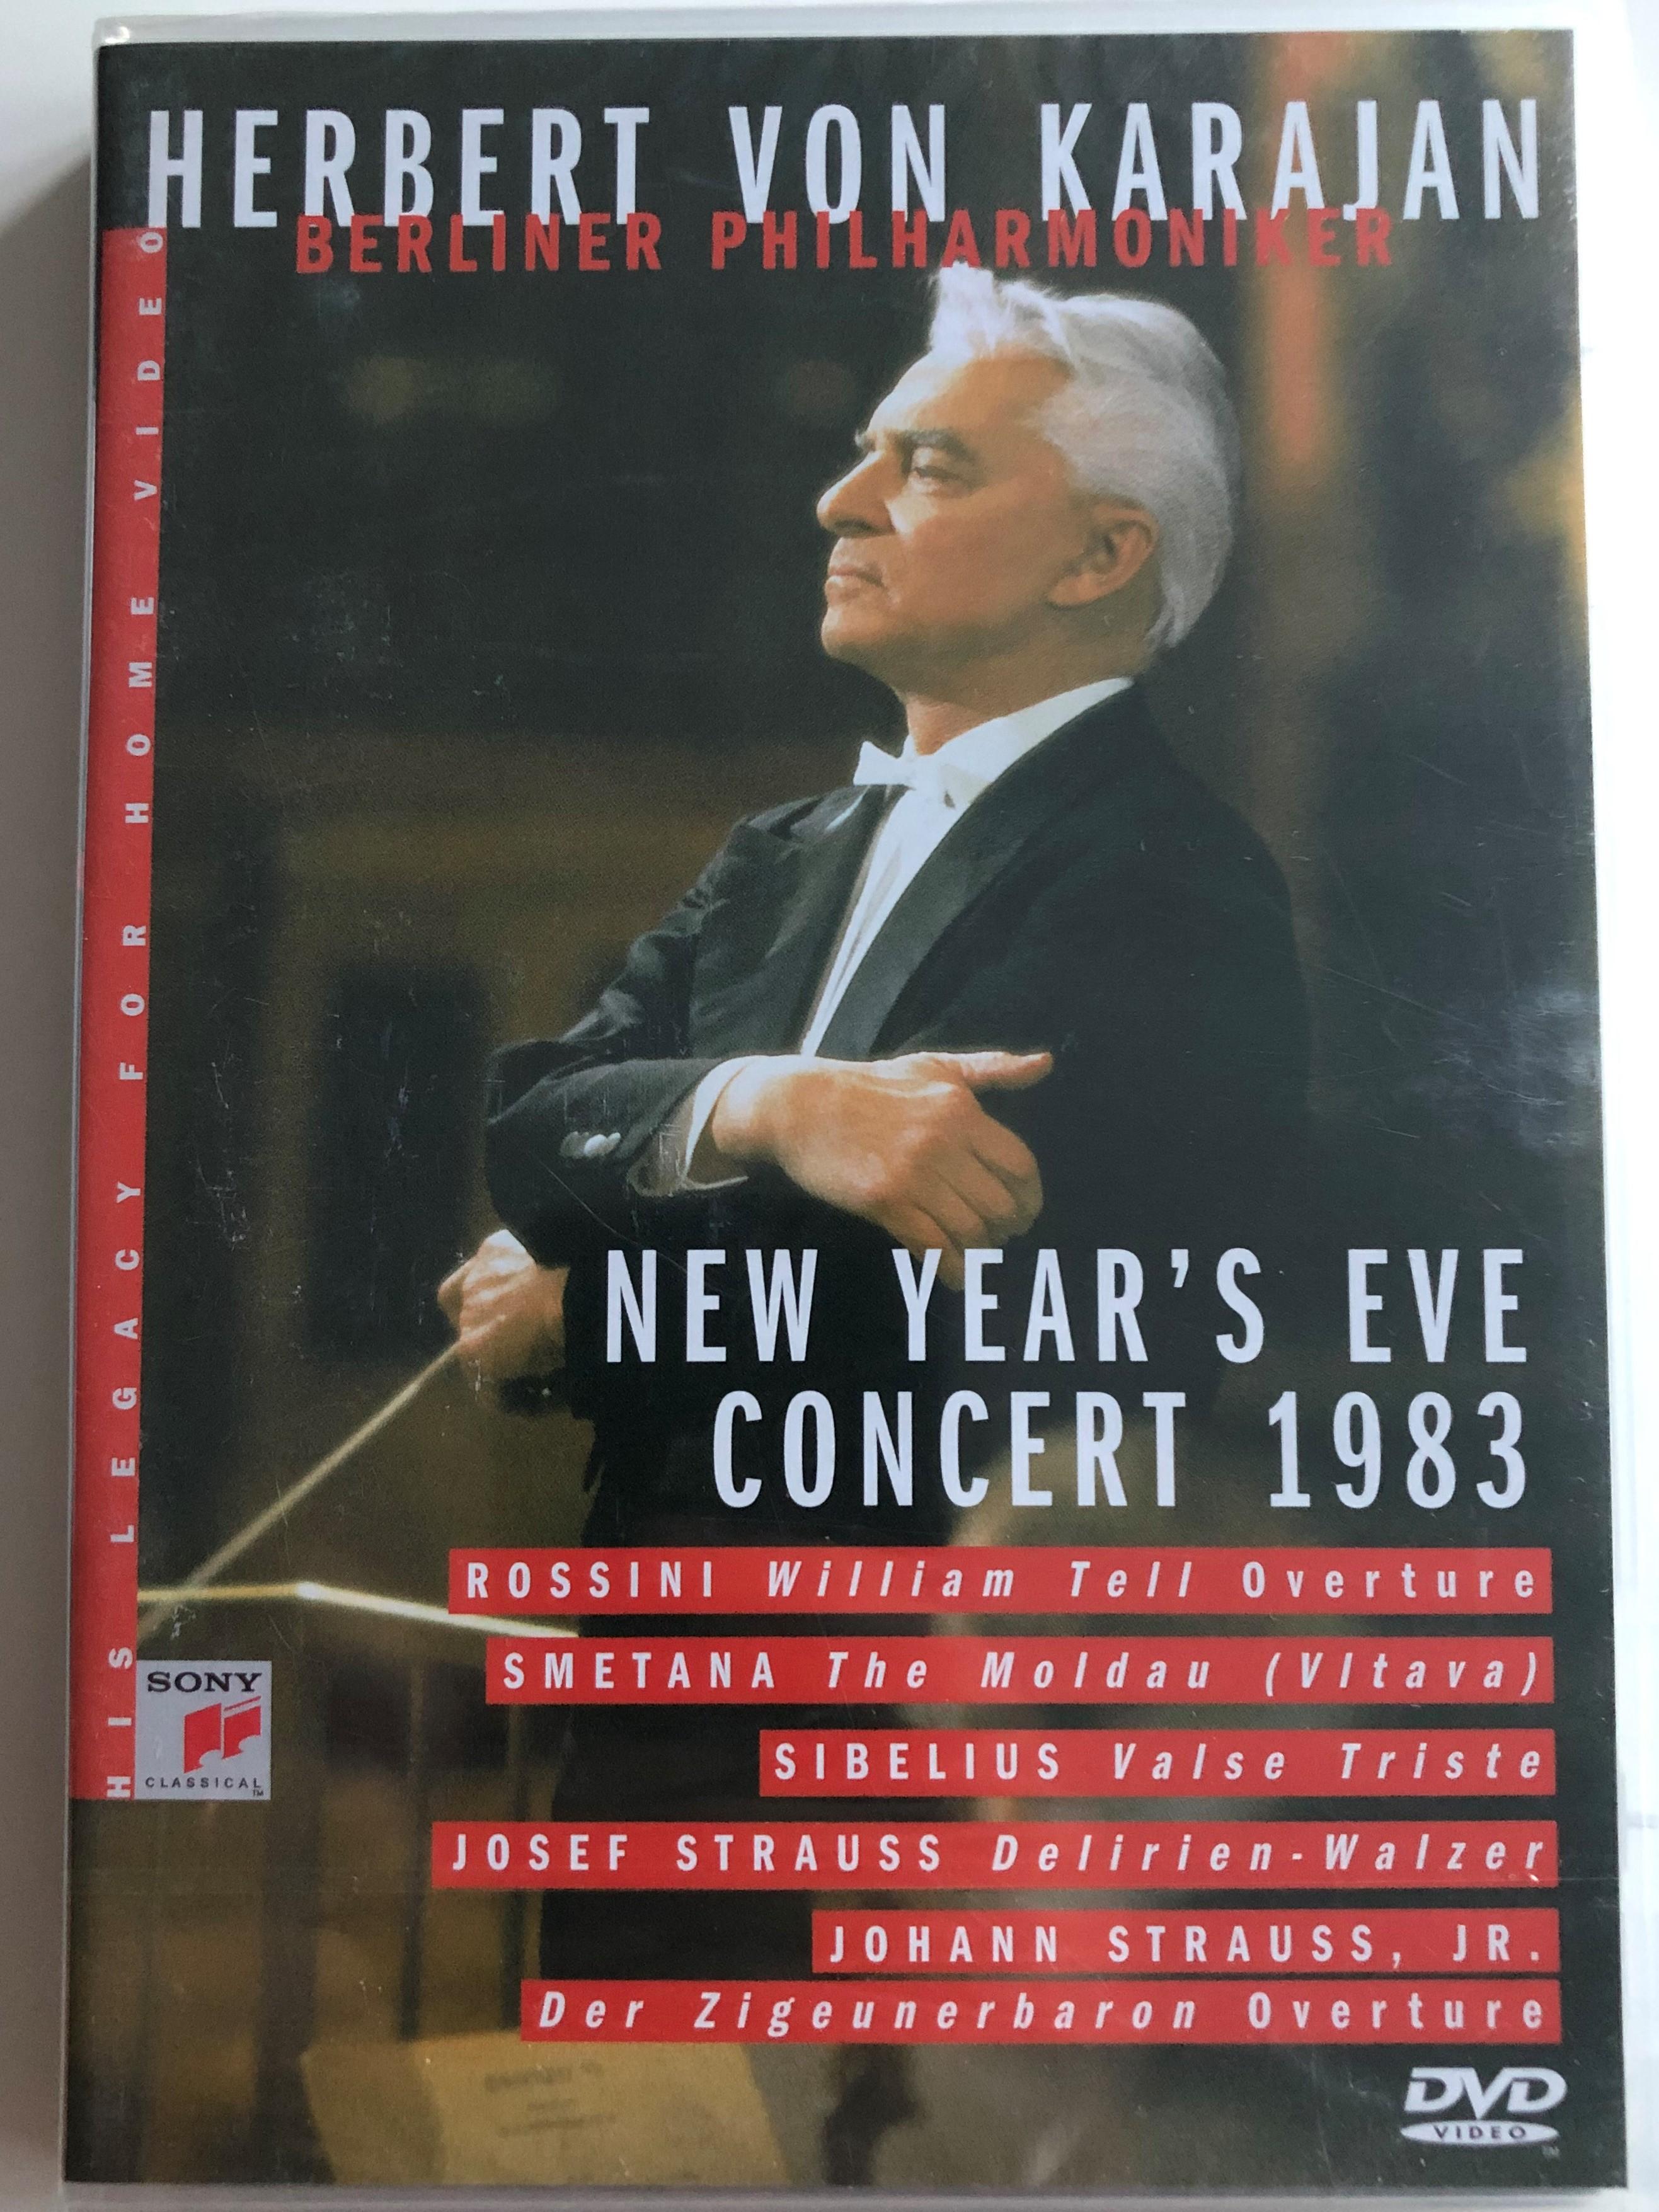 herbert-von-karajan-new-year-s-eve-concert-dvd-1983-berliner-philharmoniker-rossini-smetana-sibelius-josef-strauss-johann-strauss-jr.-svd-46401-1-.jpg